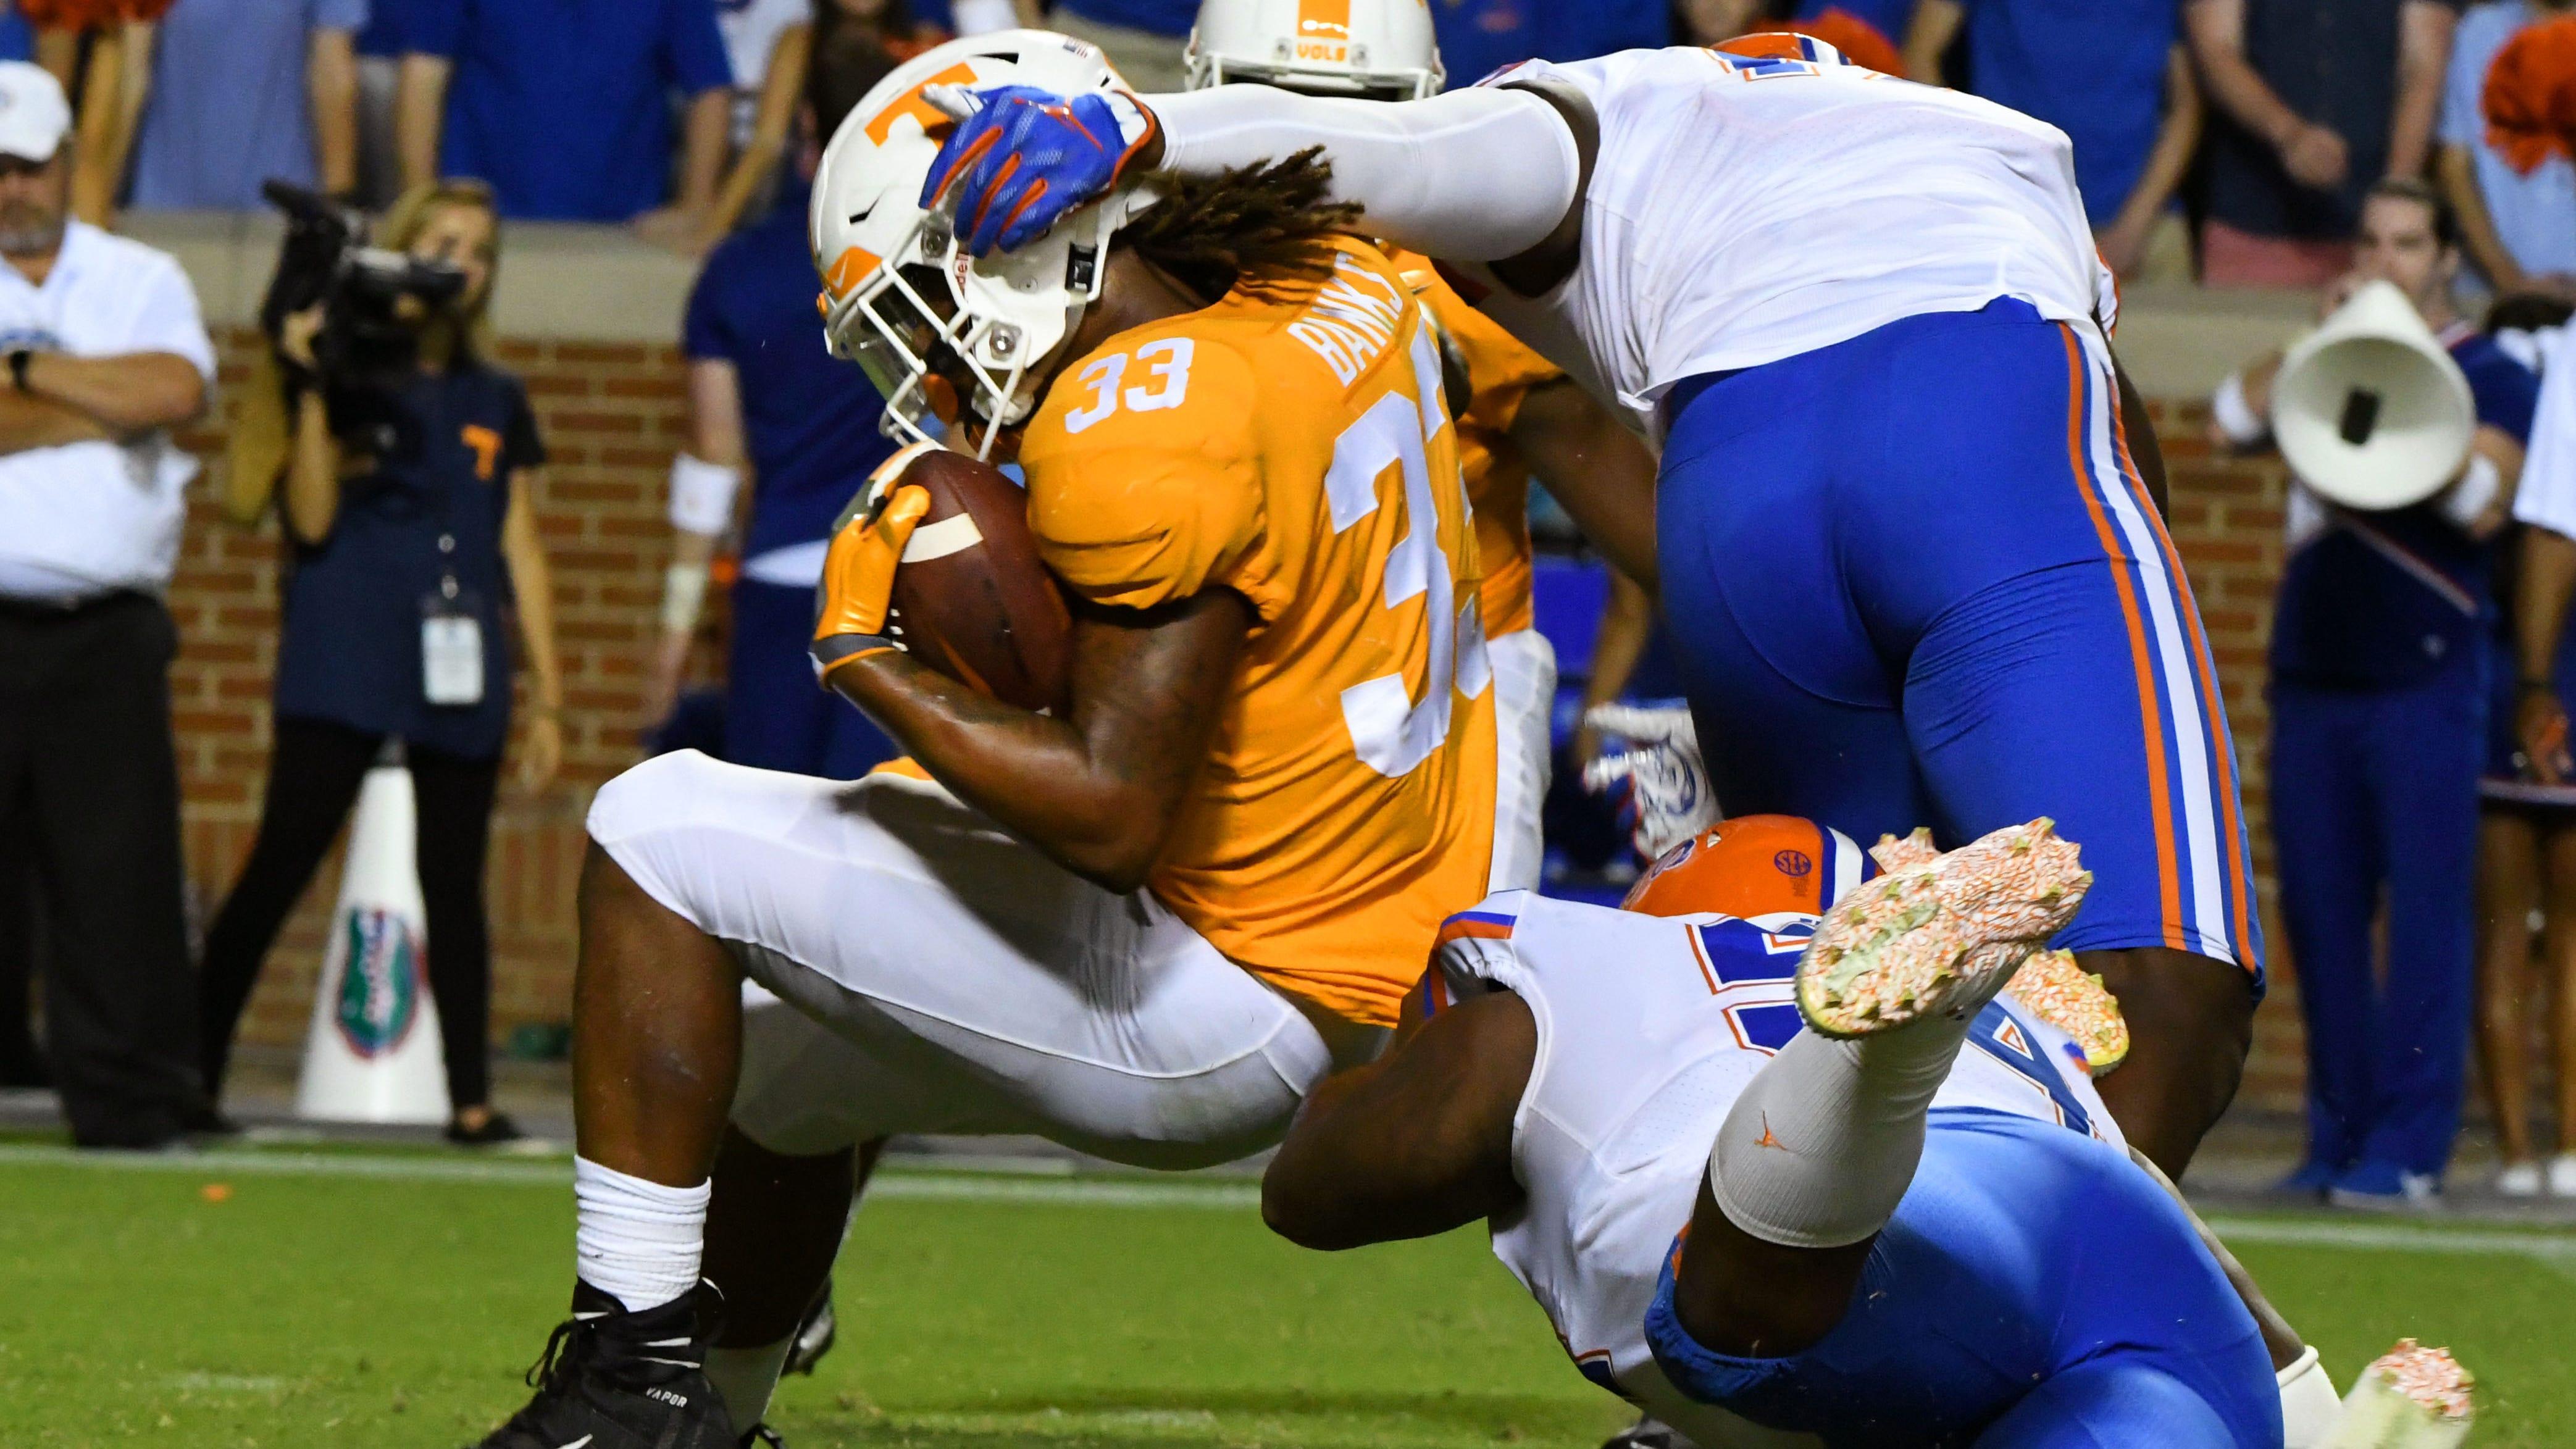 Grading the Vols: UT's offense fails in turnover-fest against Florida